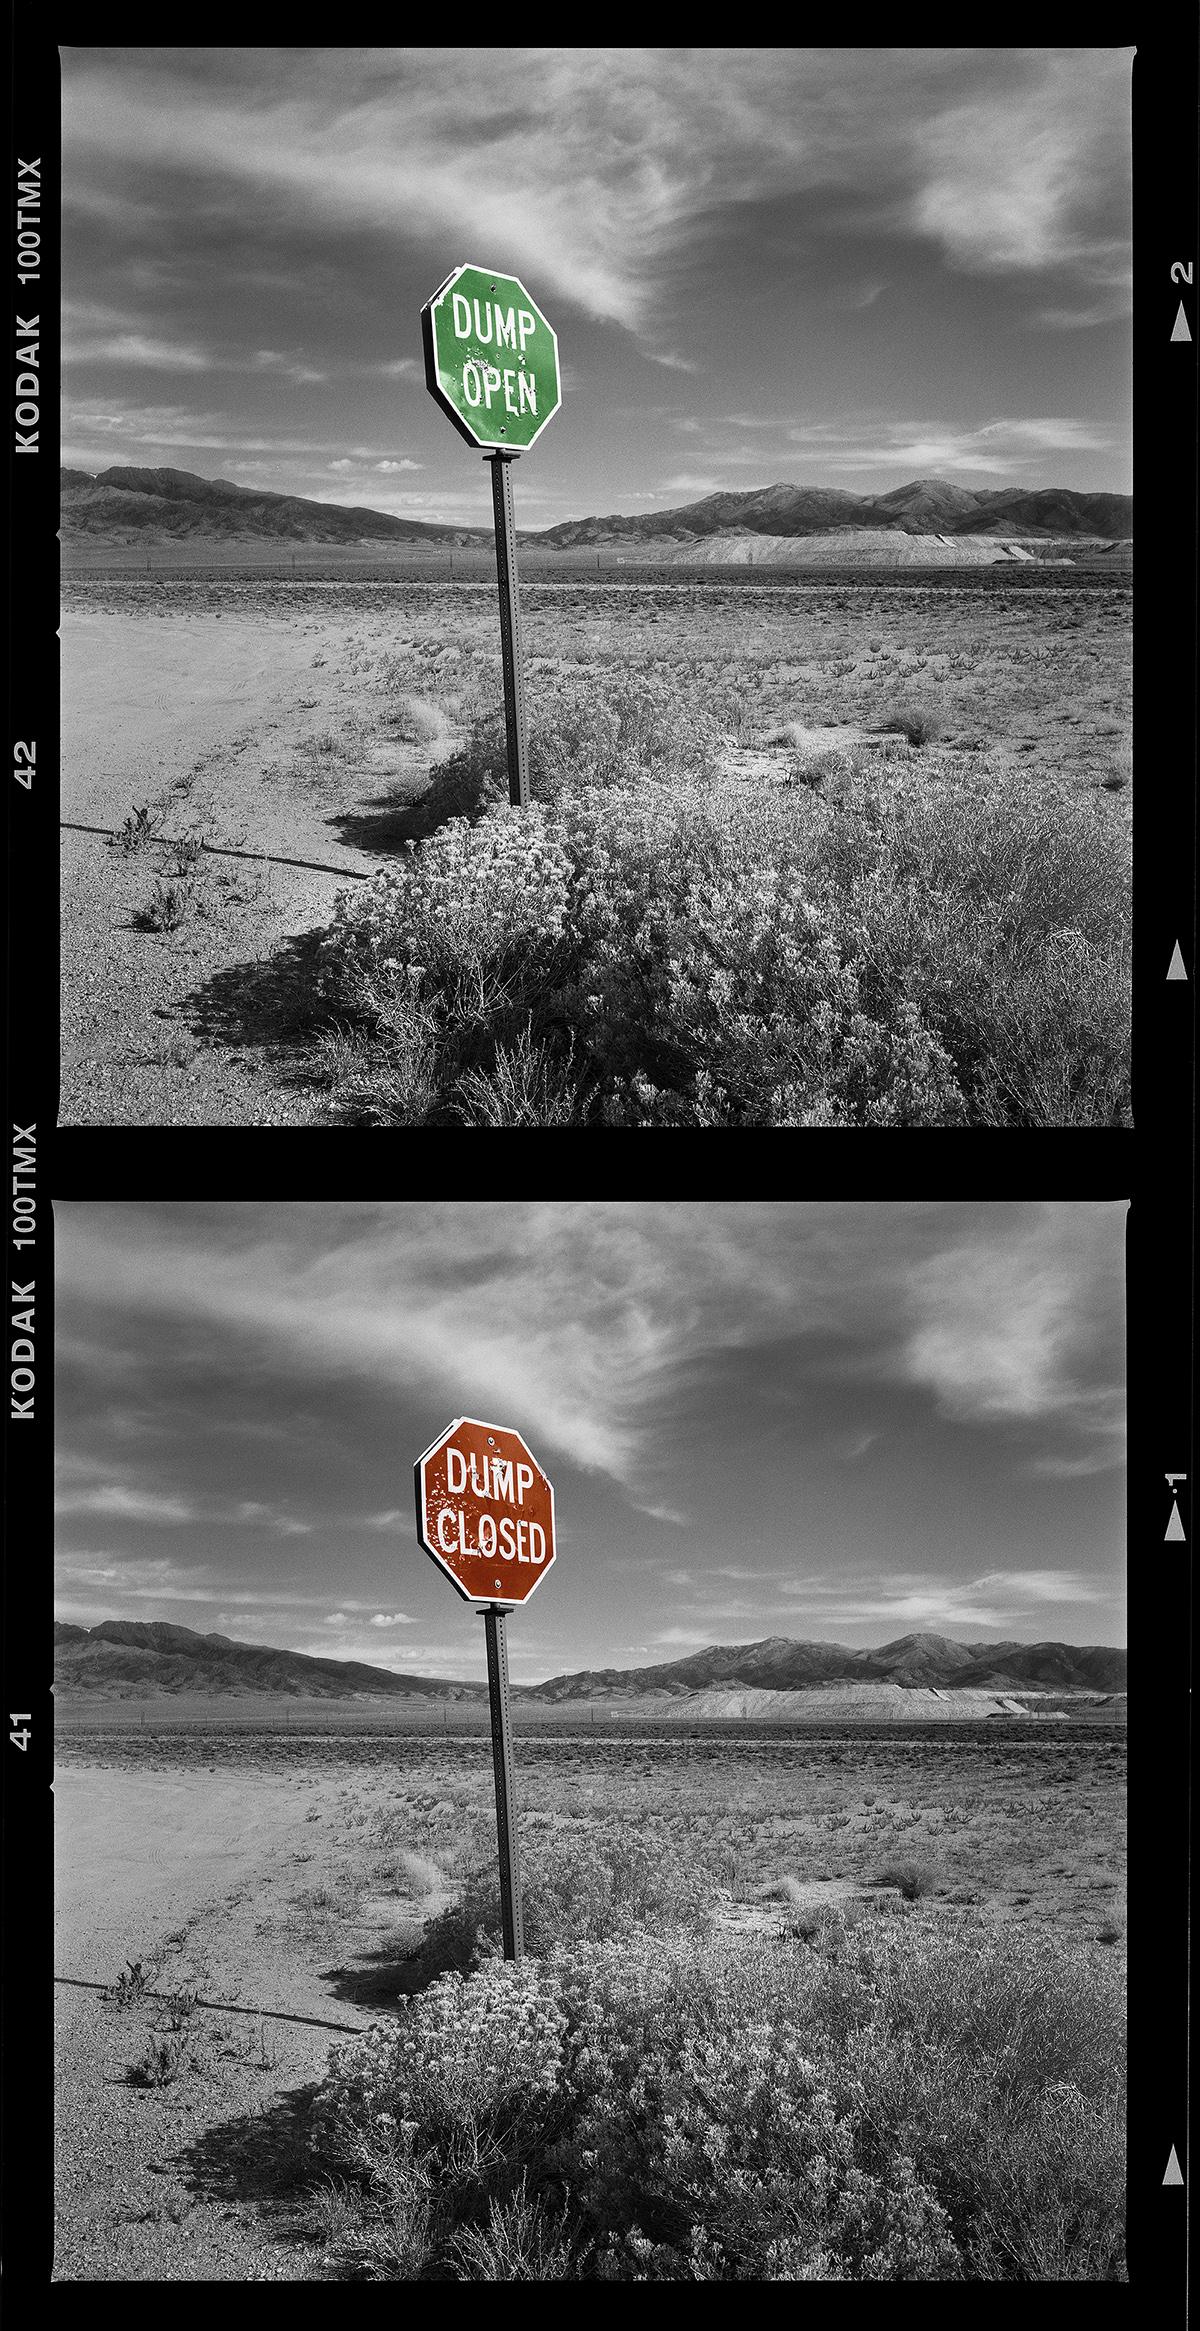 Dump Open, Dump Closed, Utah, 2008,2015